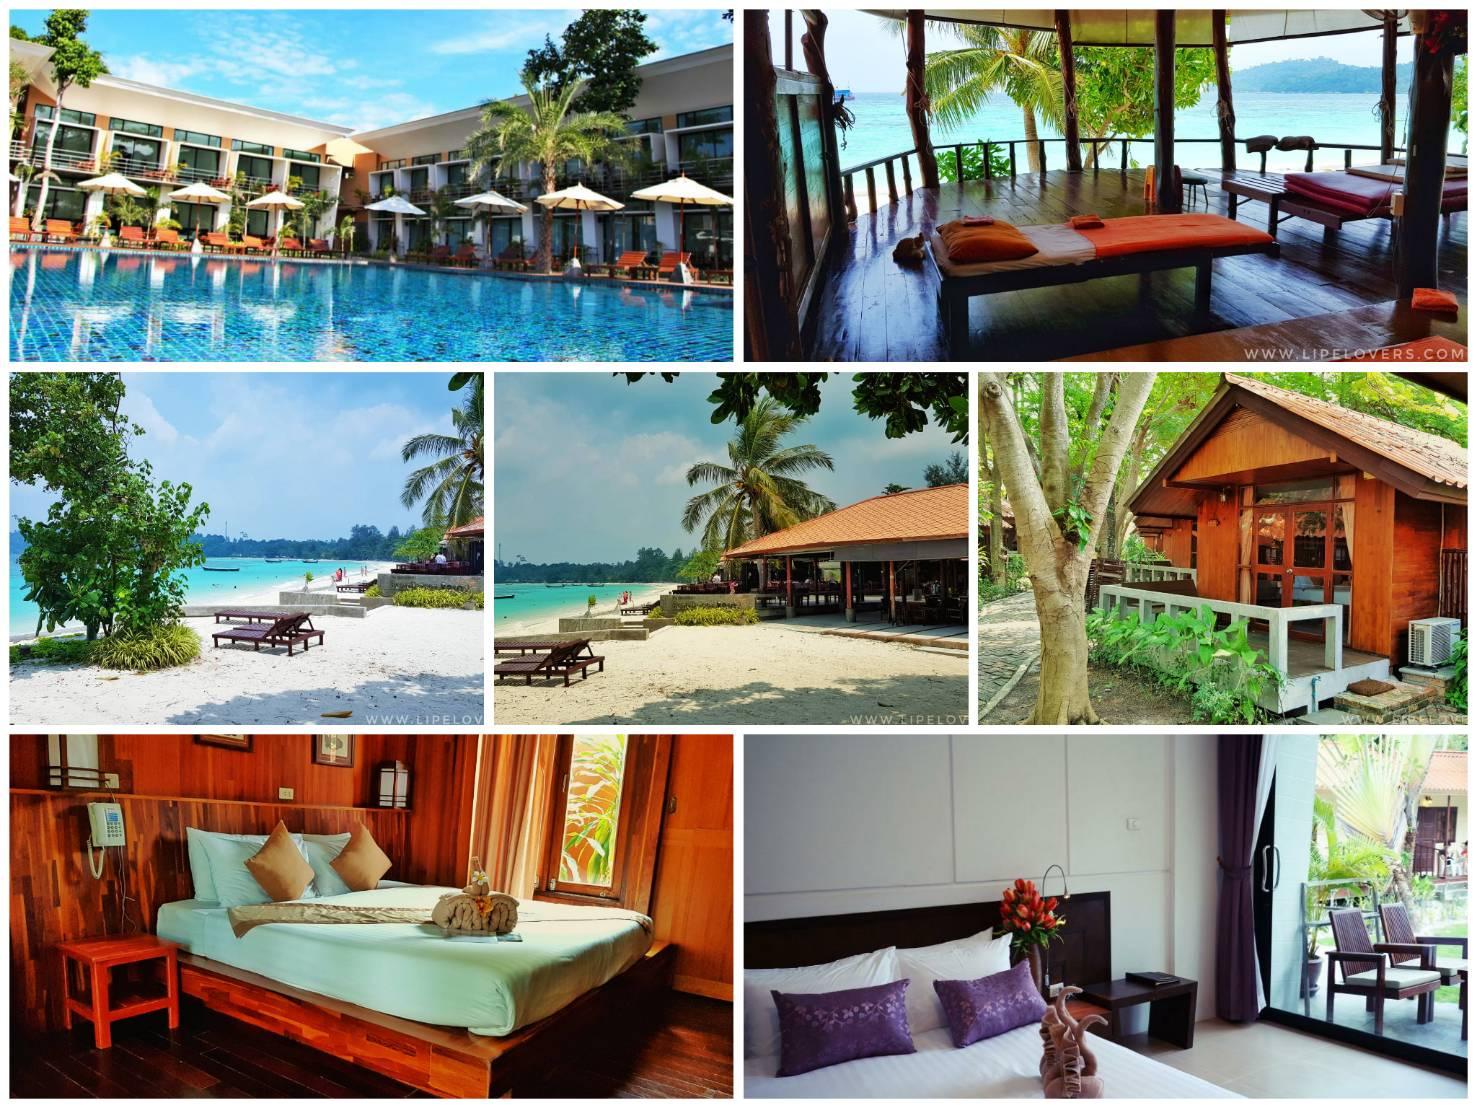 Bundhaya Resort (บันดาหยา รีสอร์ท)